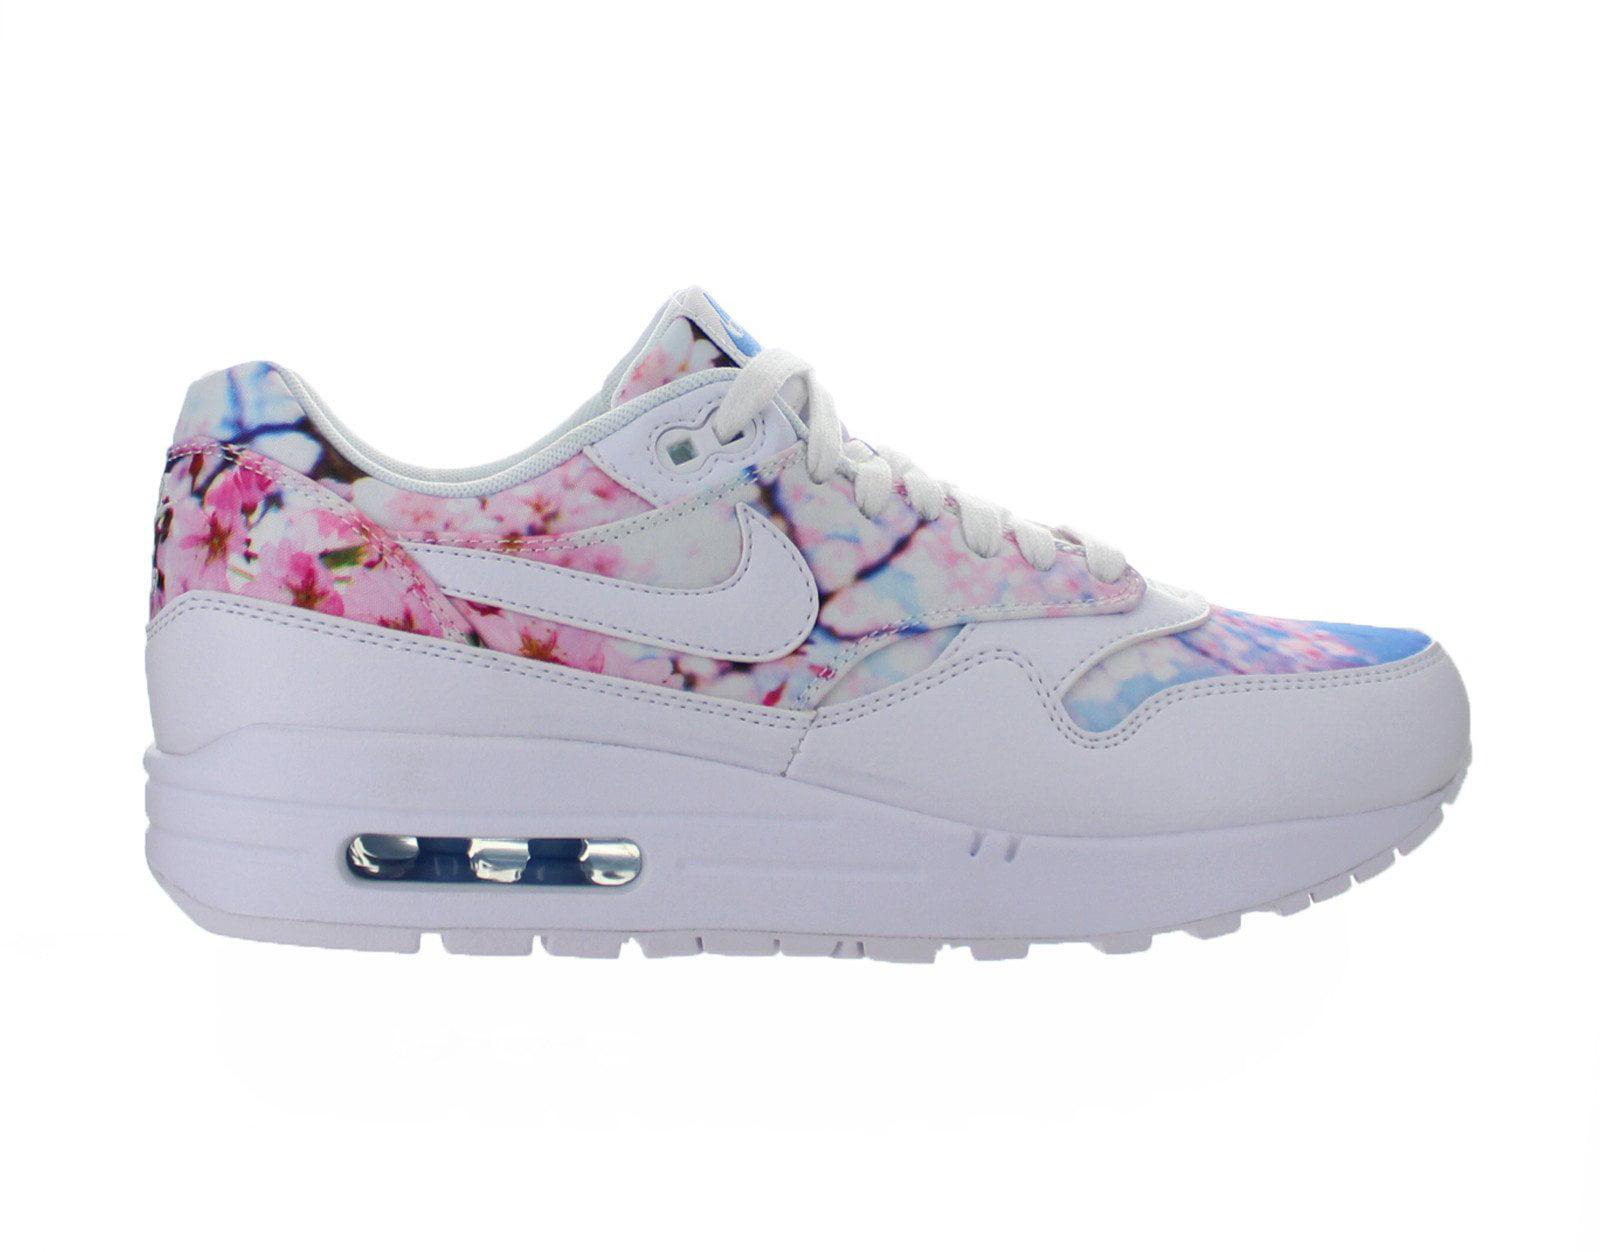 super popular 6ea82 c1254 Nike - Womens Nike Air Max 1 Print Cherry Blossom White University ...